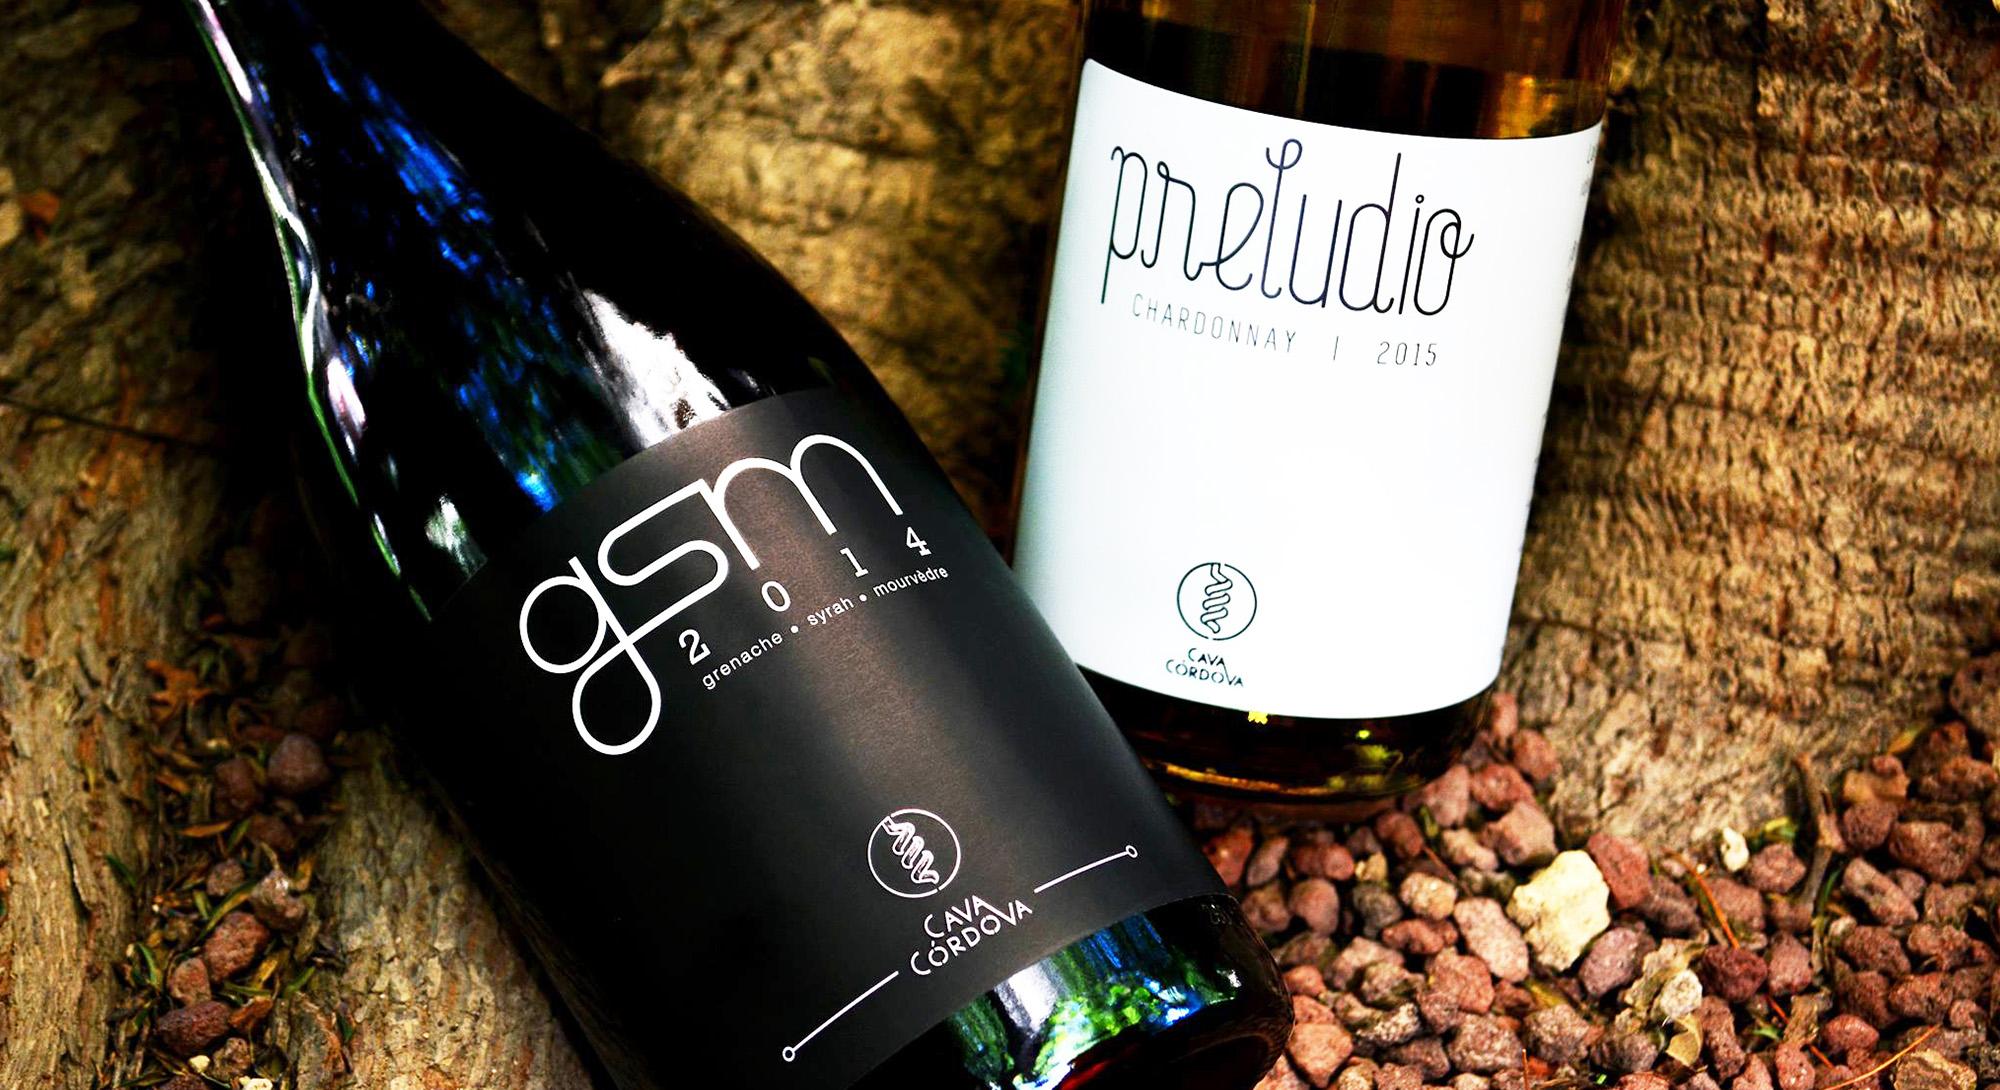 Uve attentamente selezionate per vini di qualità